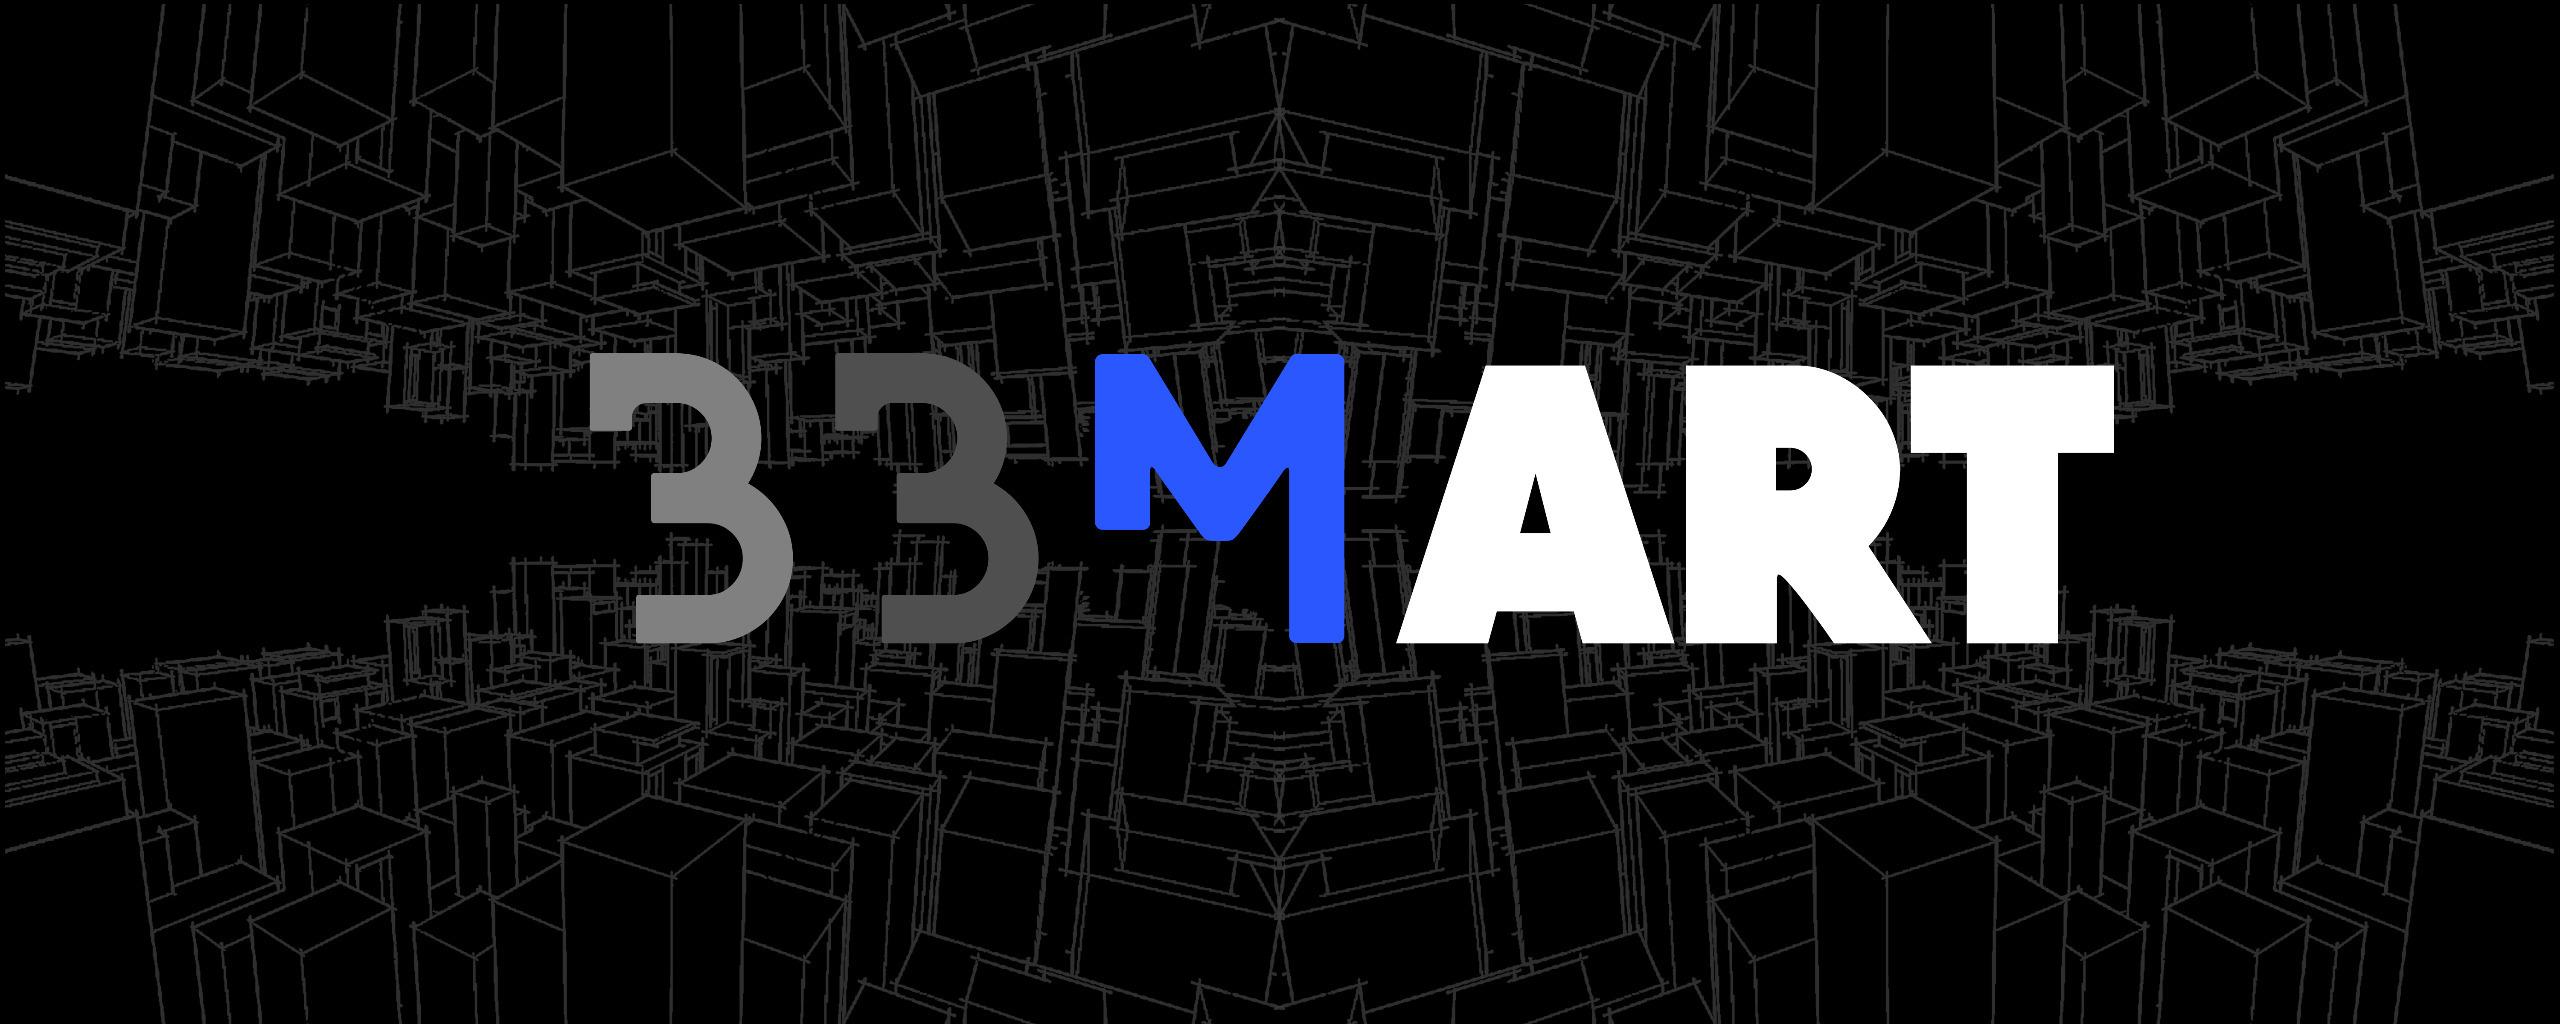 BREN BEN MACCABEE (@bbmart) Cover Image